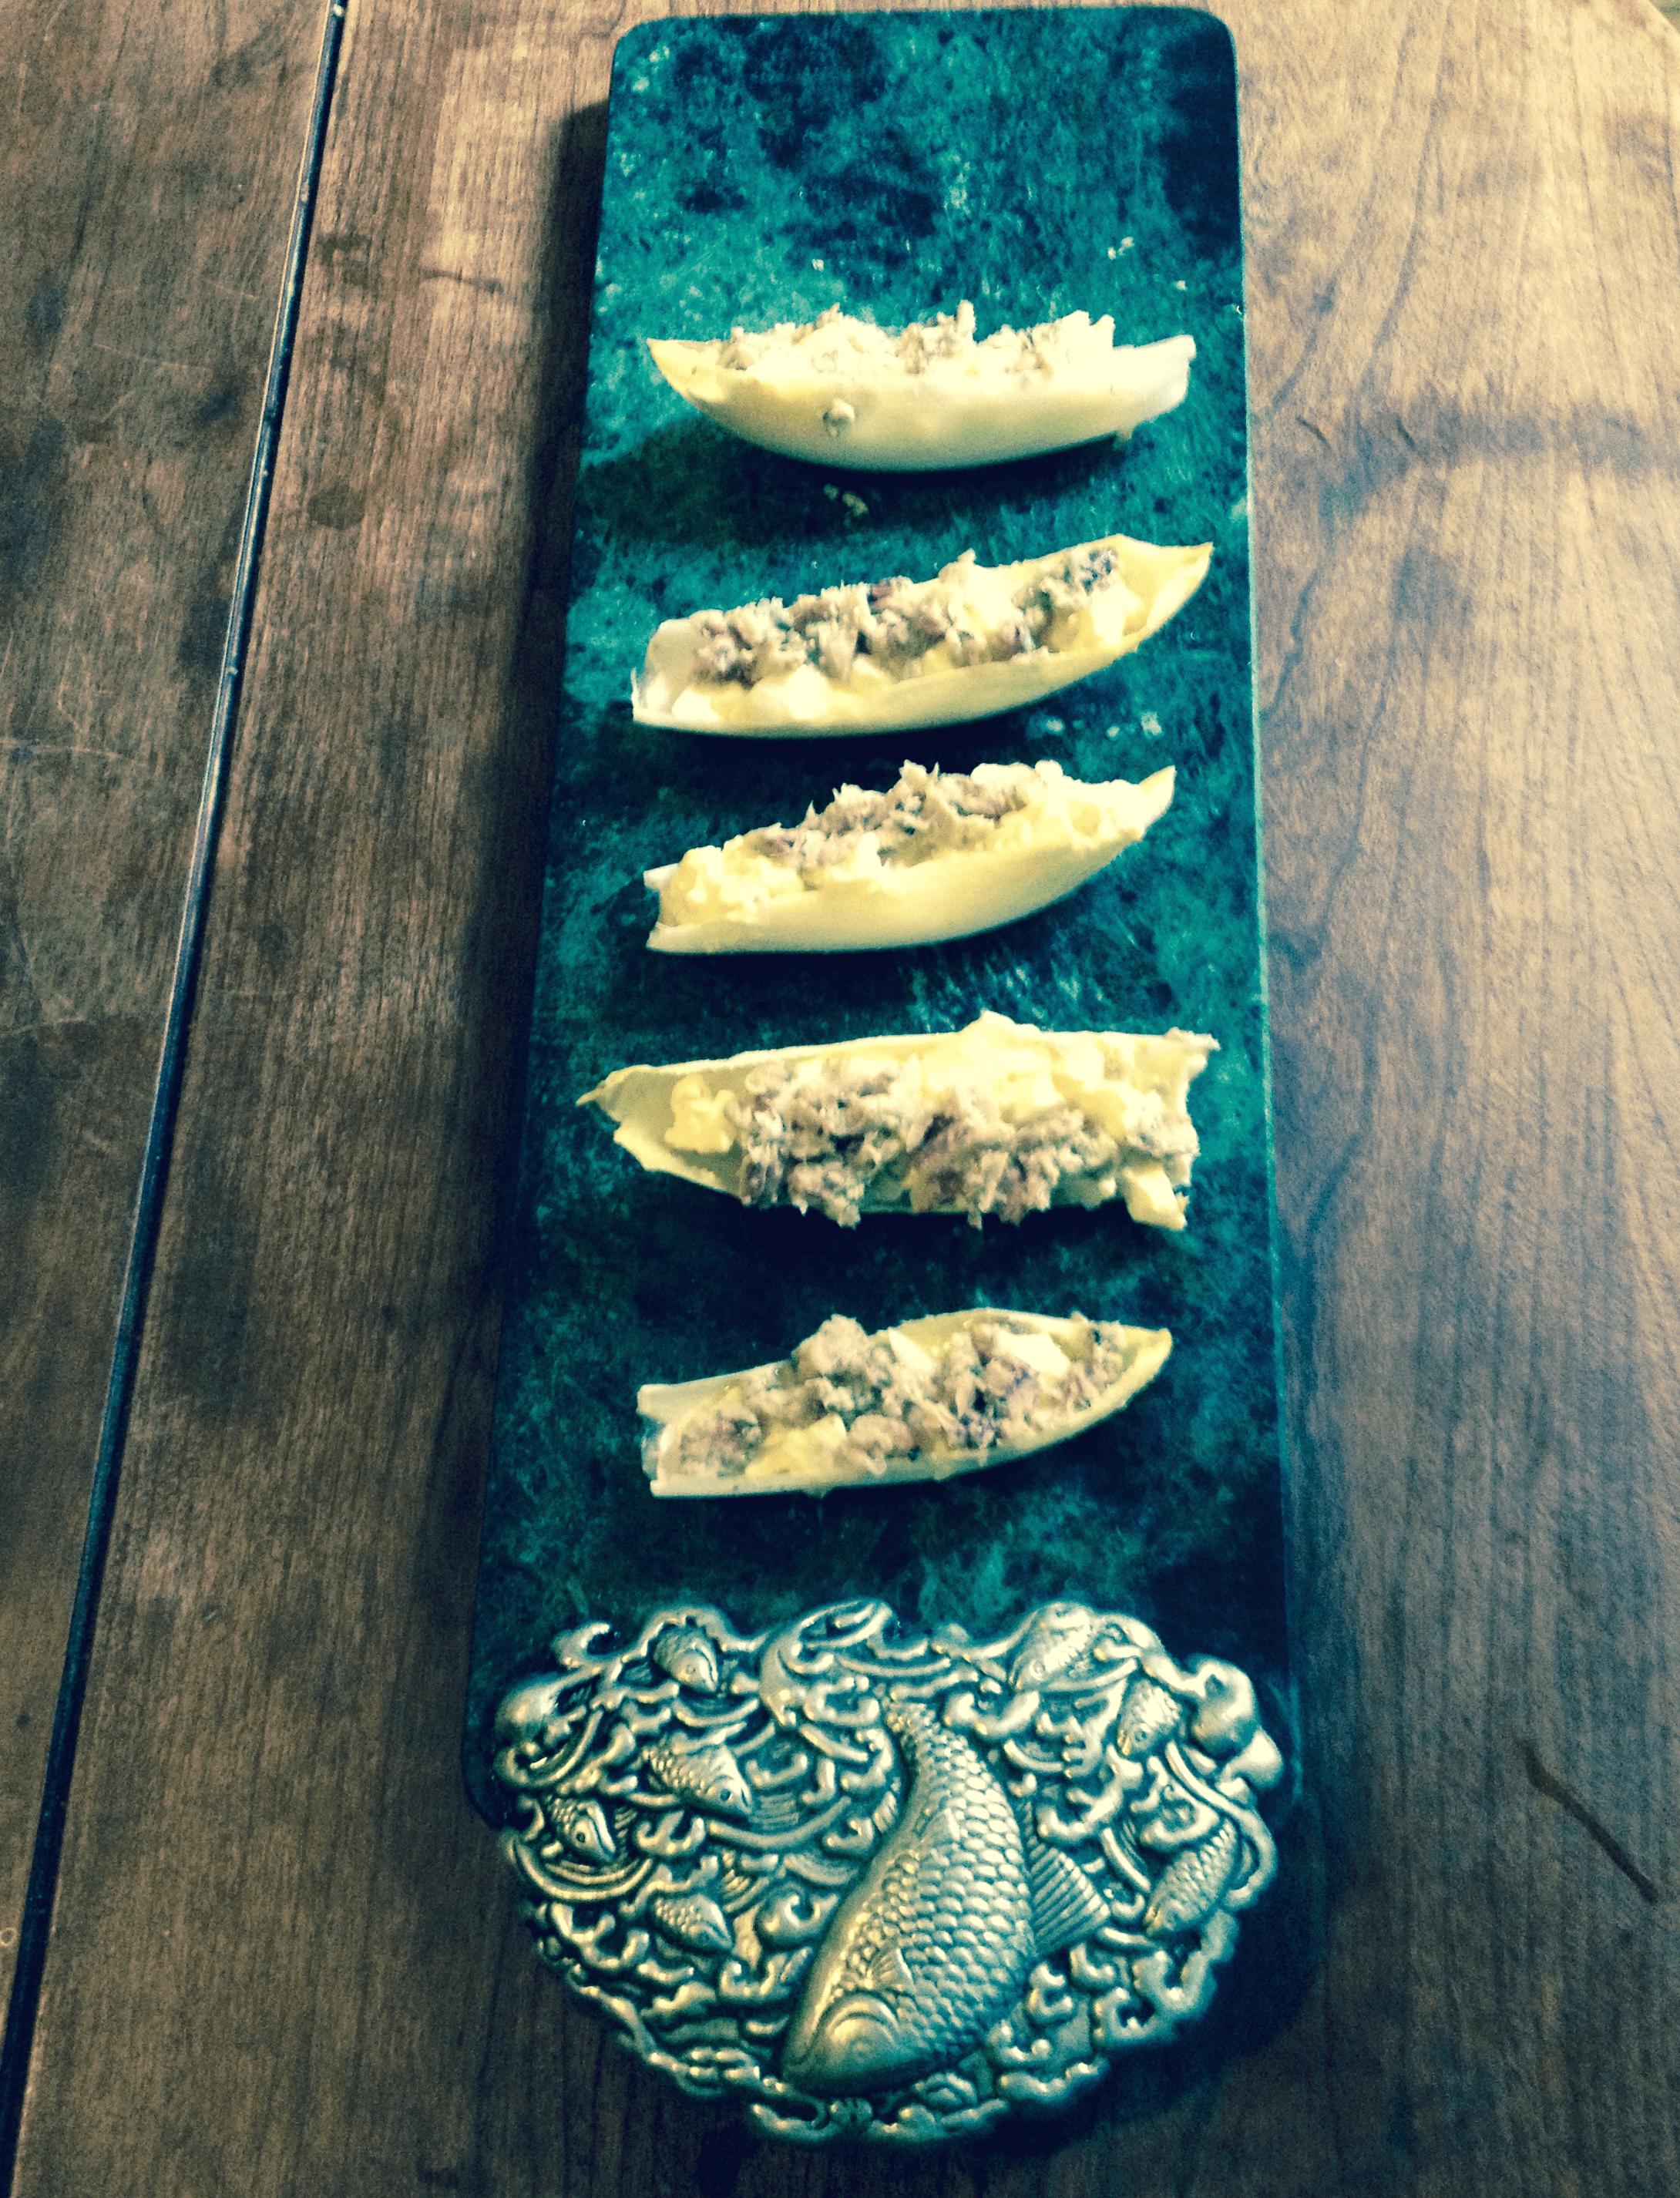 Sardines in a canoe - healthy gluten free snack